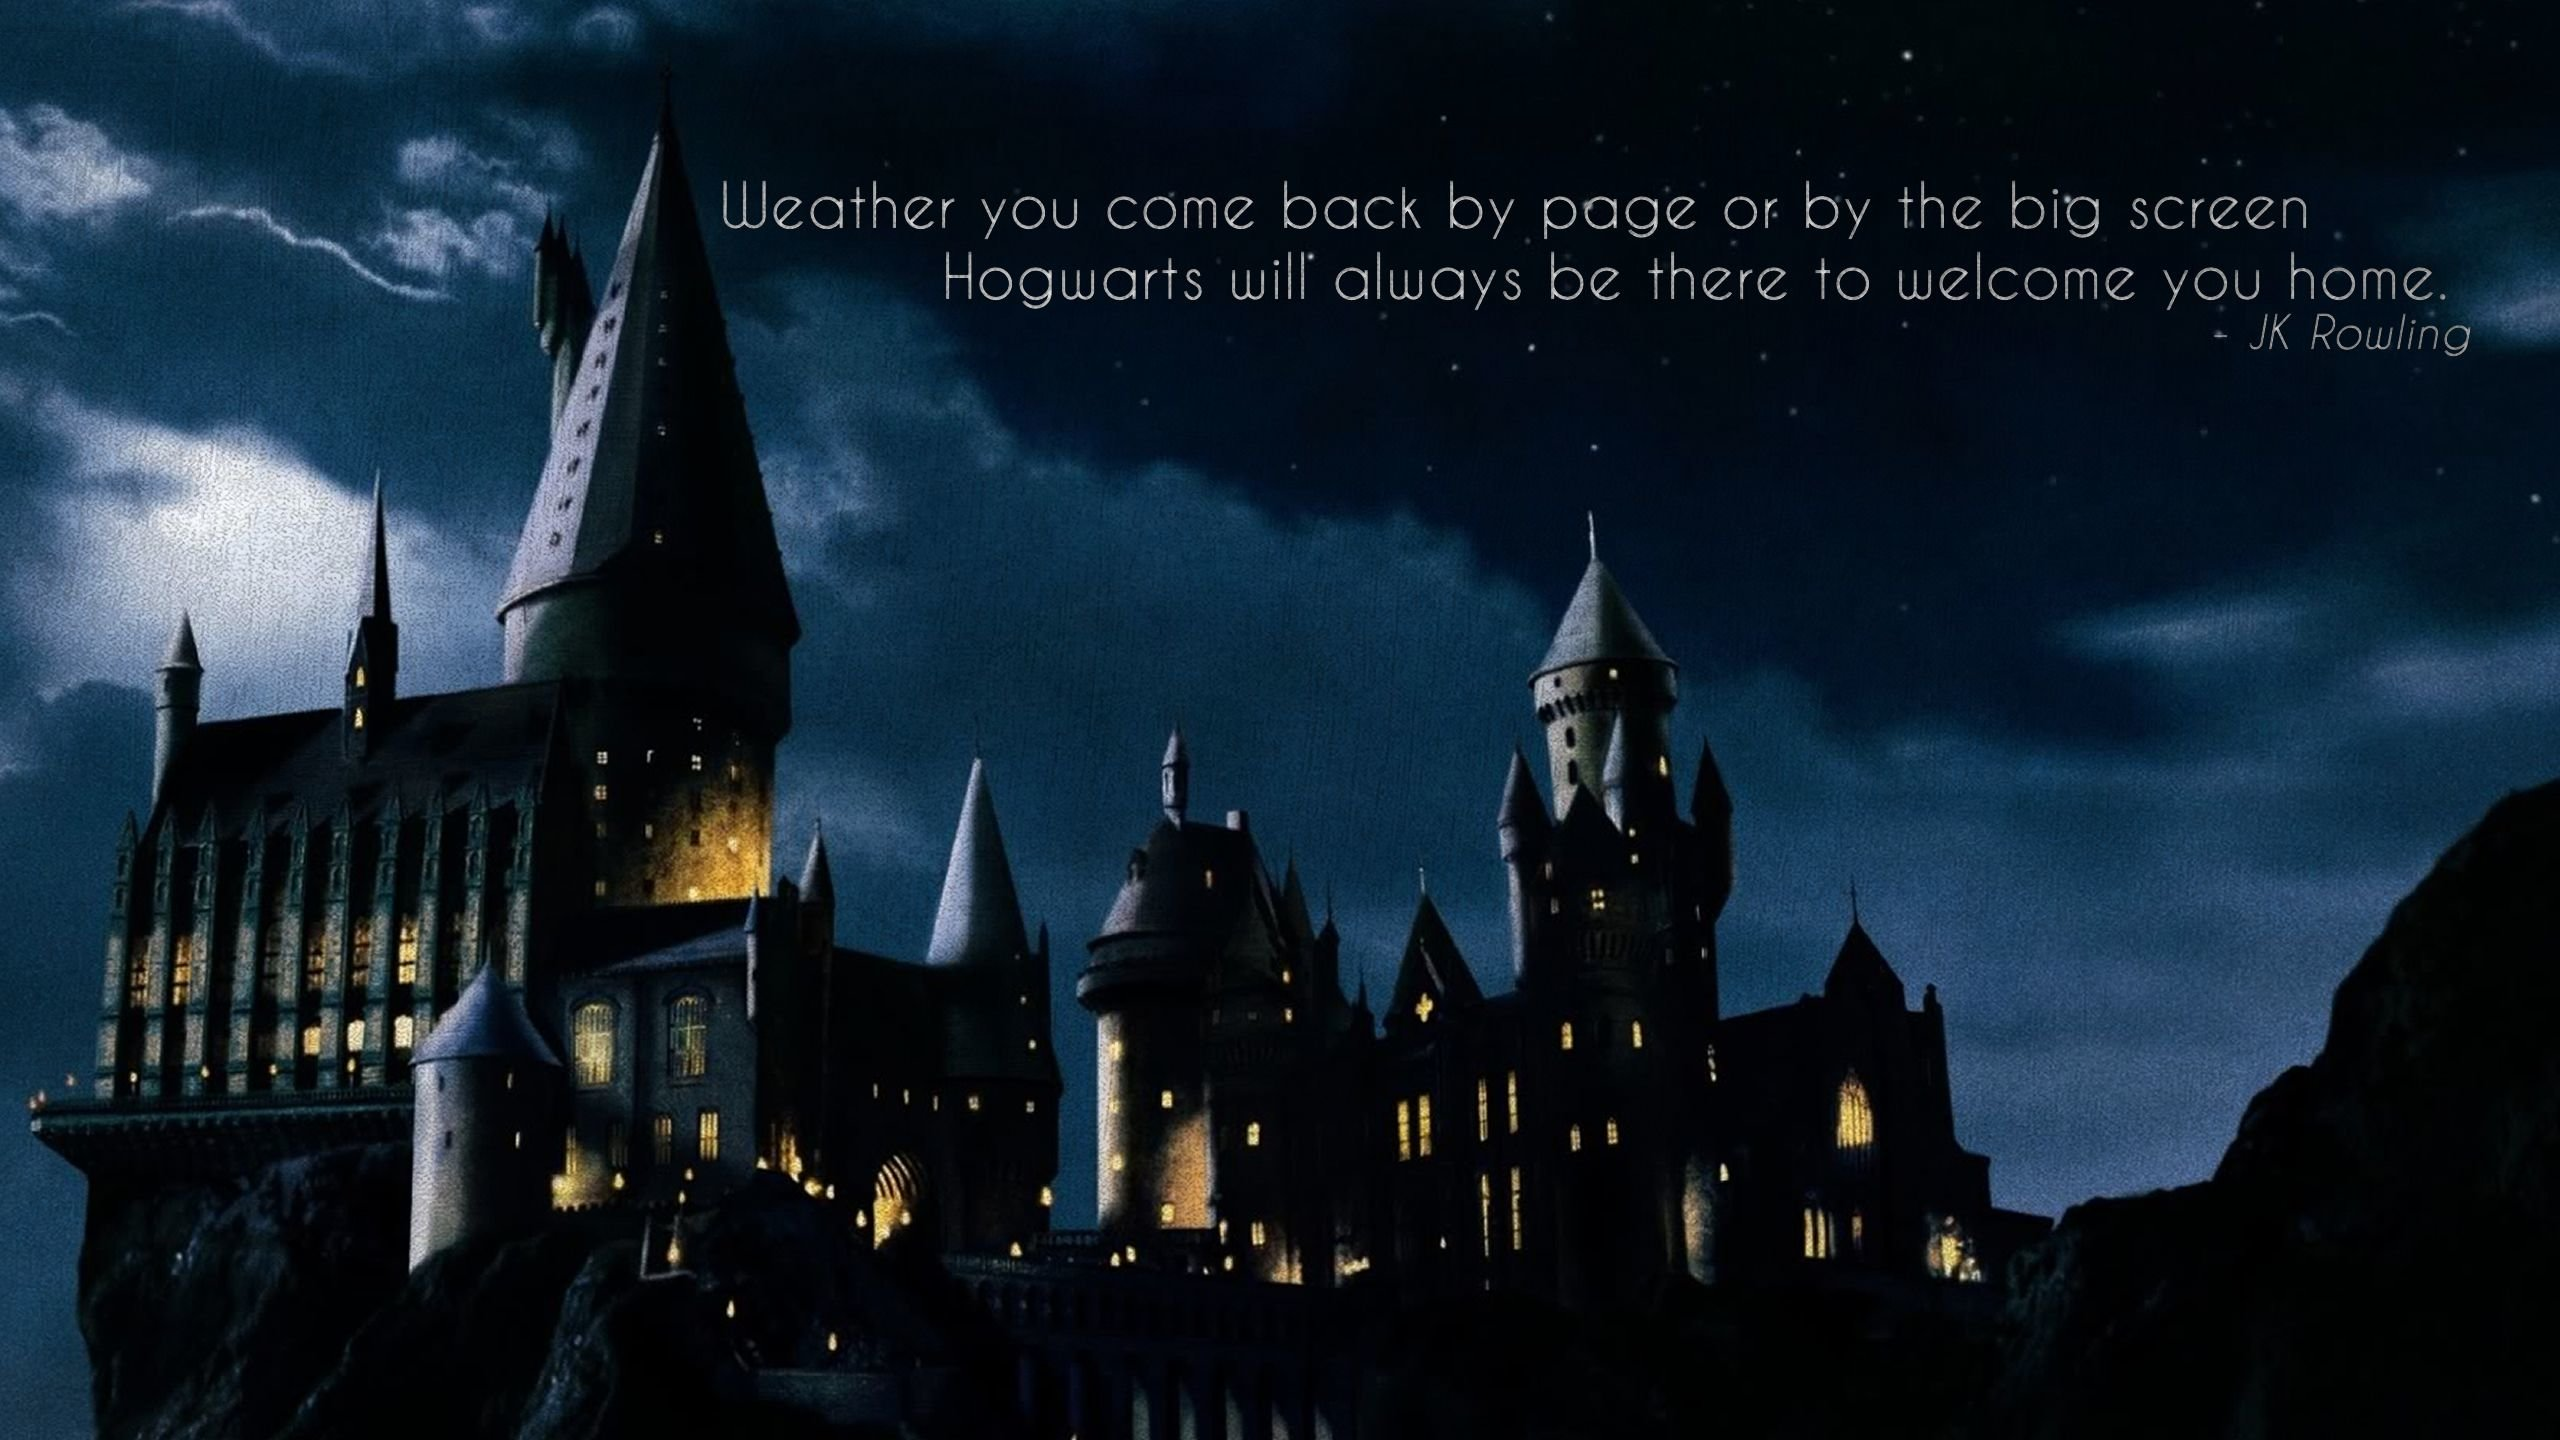 Most Inspiring Wallpaper Harry Potter Rose Gold - harry-potter-wallpaper-hd-2560x1440-463369  Snapshot_159498.jpg